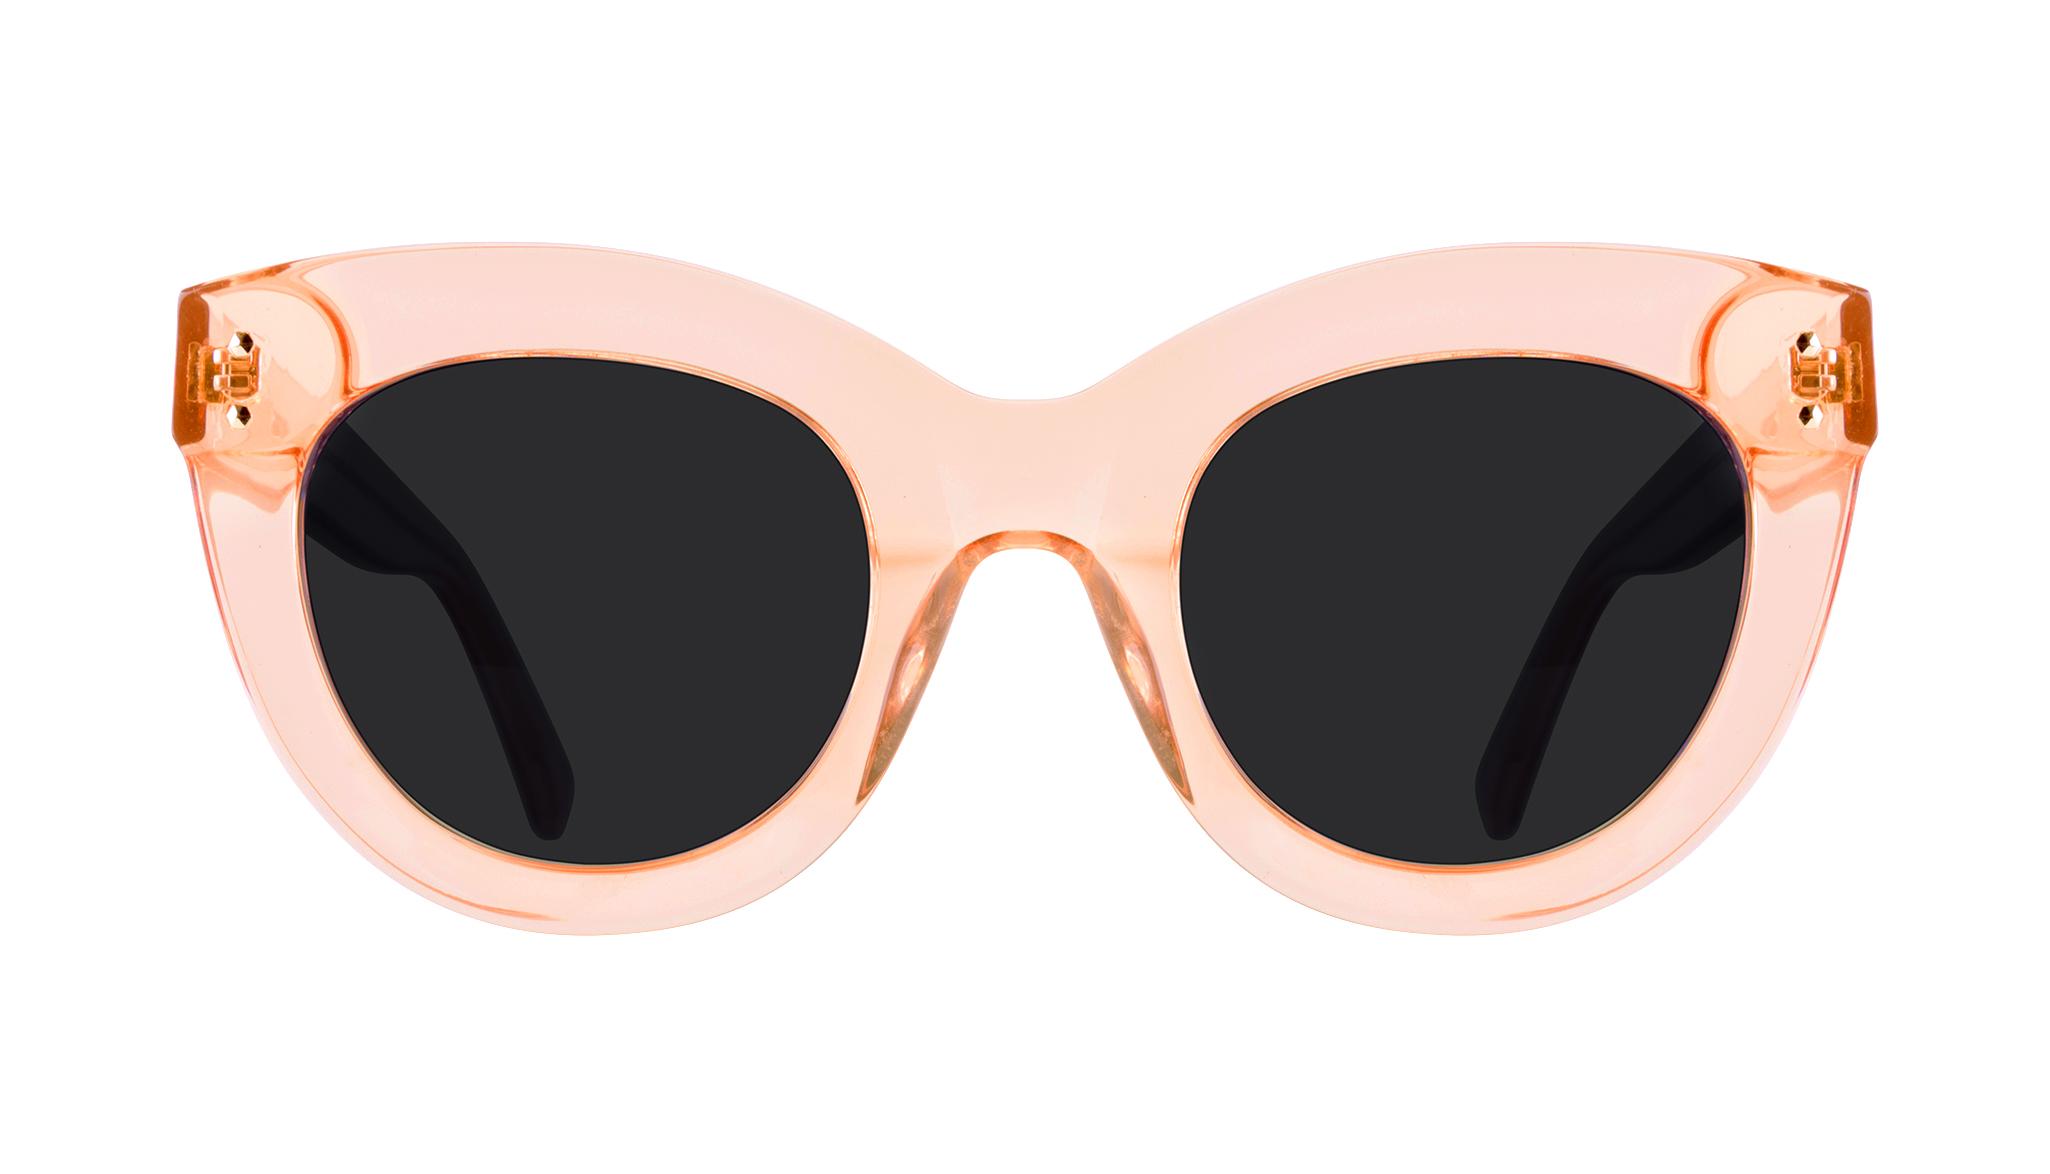 Womens Affordable Affordable Affordable Sunglasses Womens Sunglasses Womens ucT31KJlF